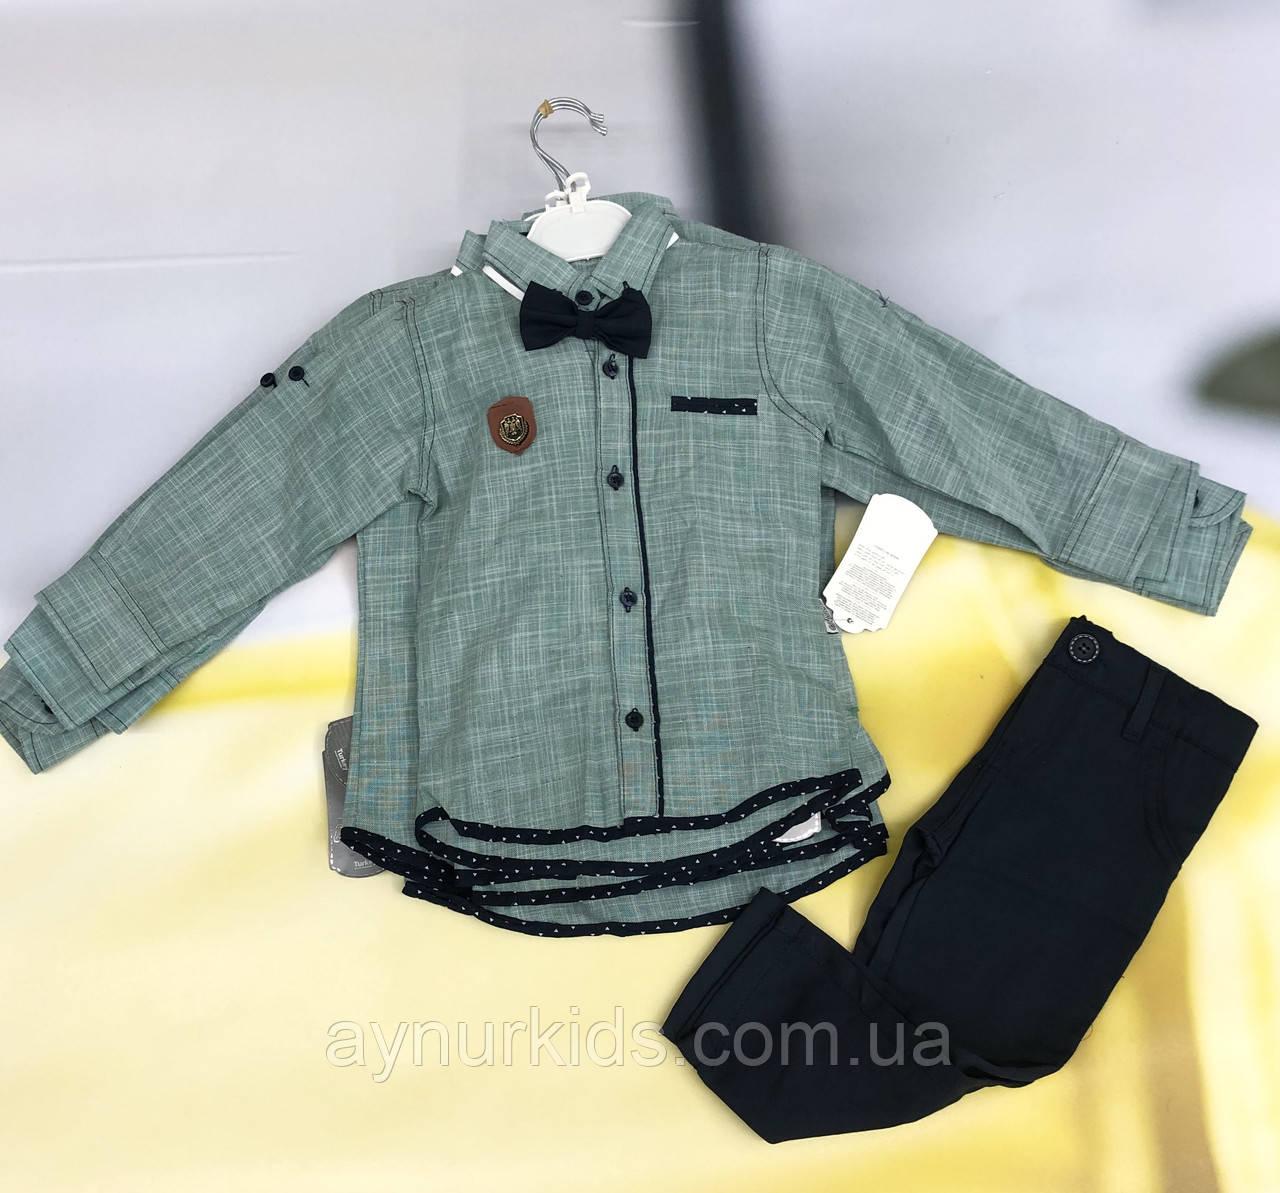 Комплект: рубашка, брюки и бабочка 1,2,3,4 года ОПТОМ